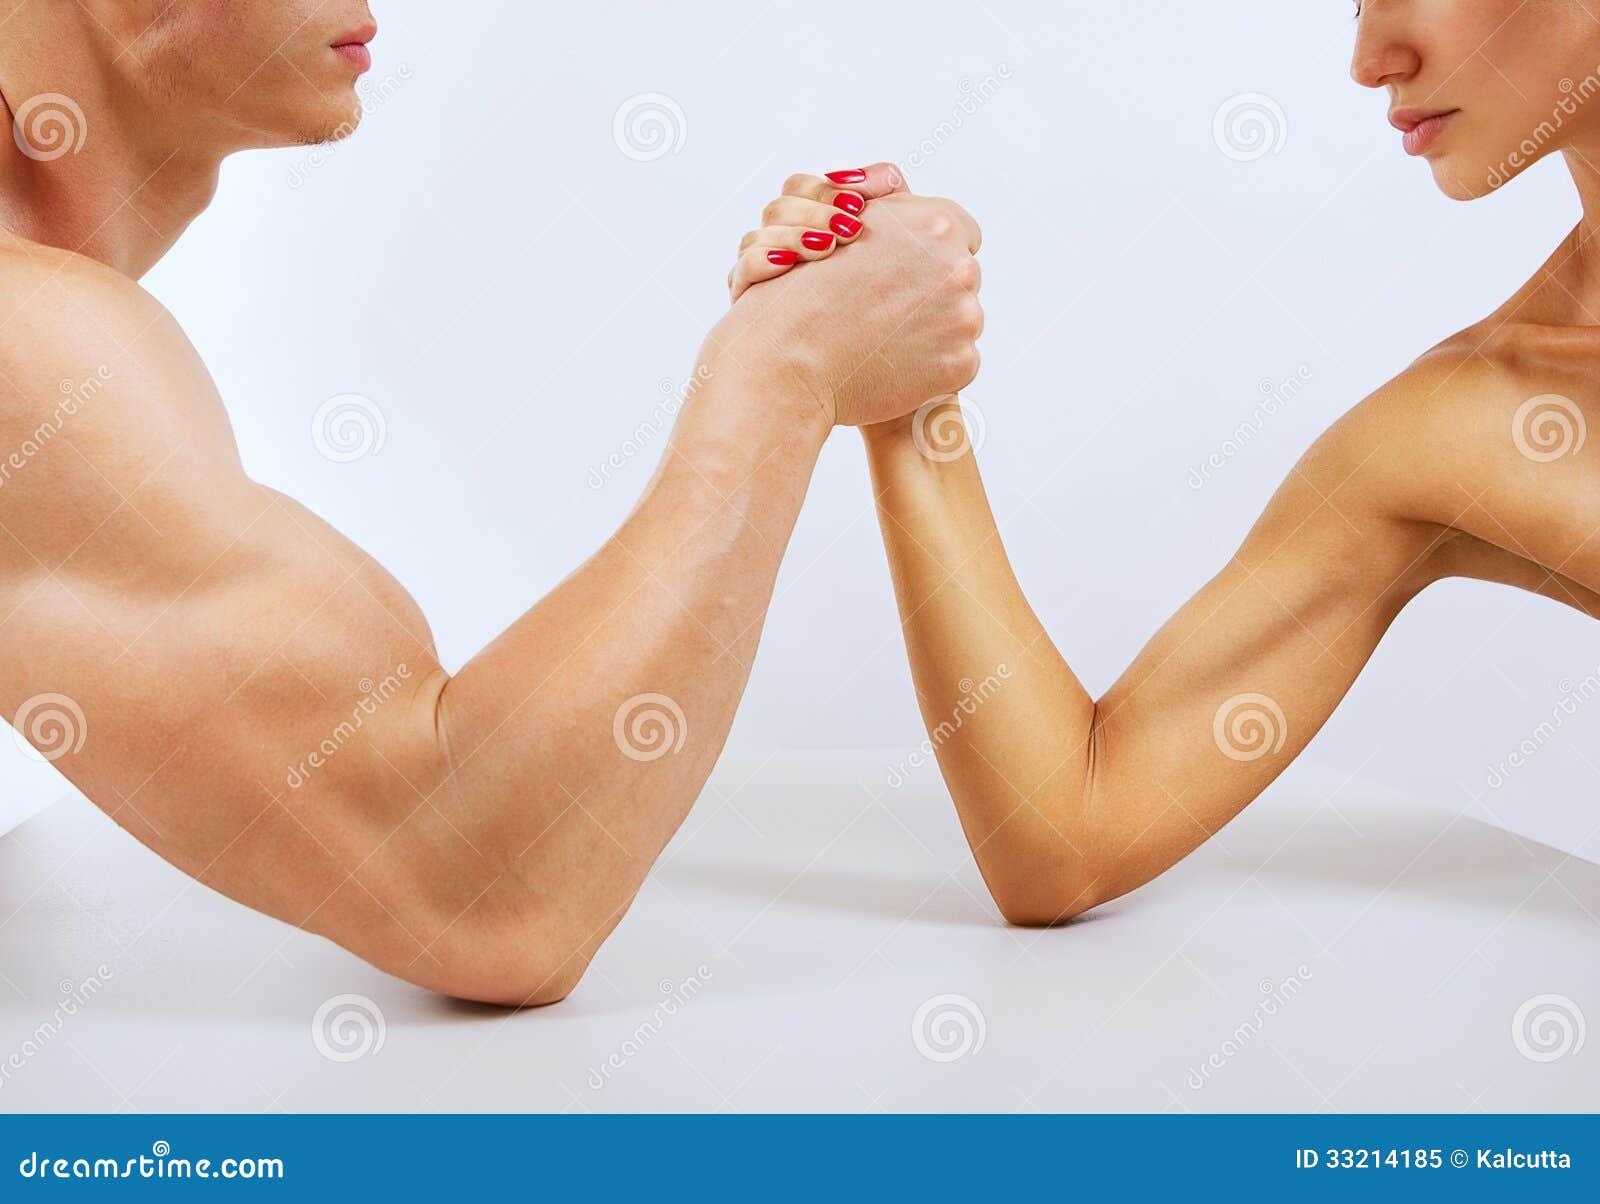 man vs woman nude wrestling